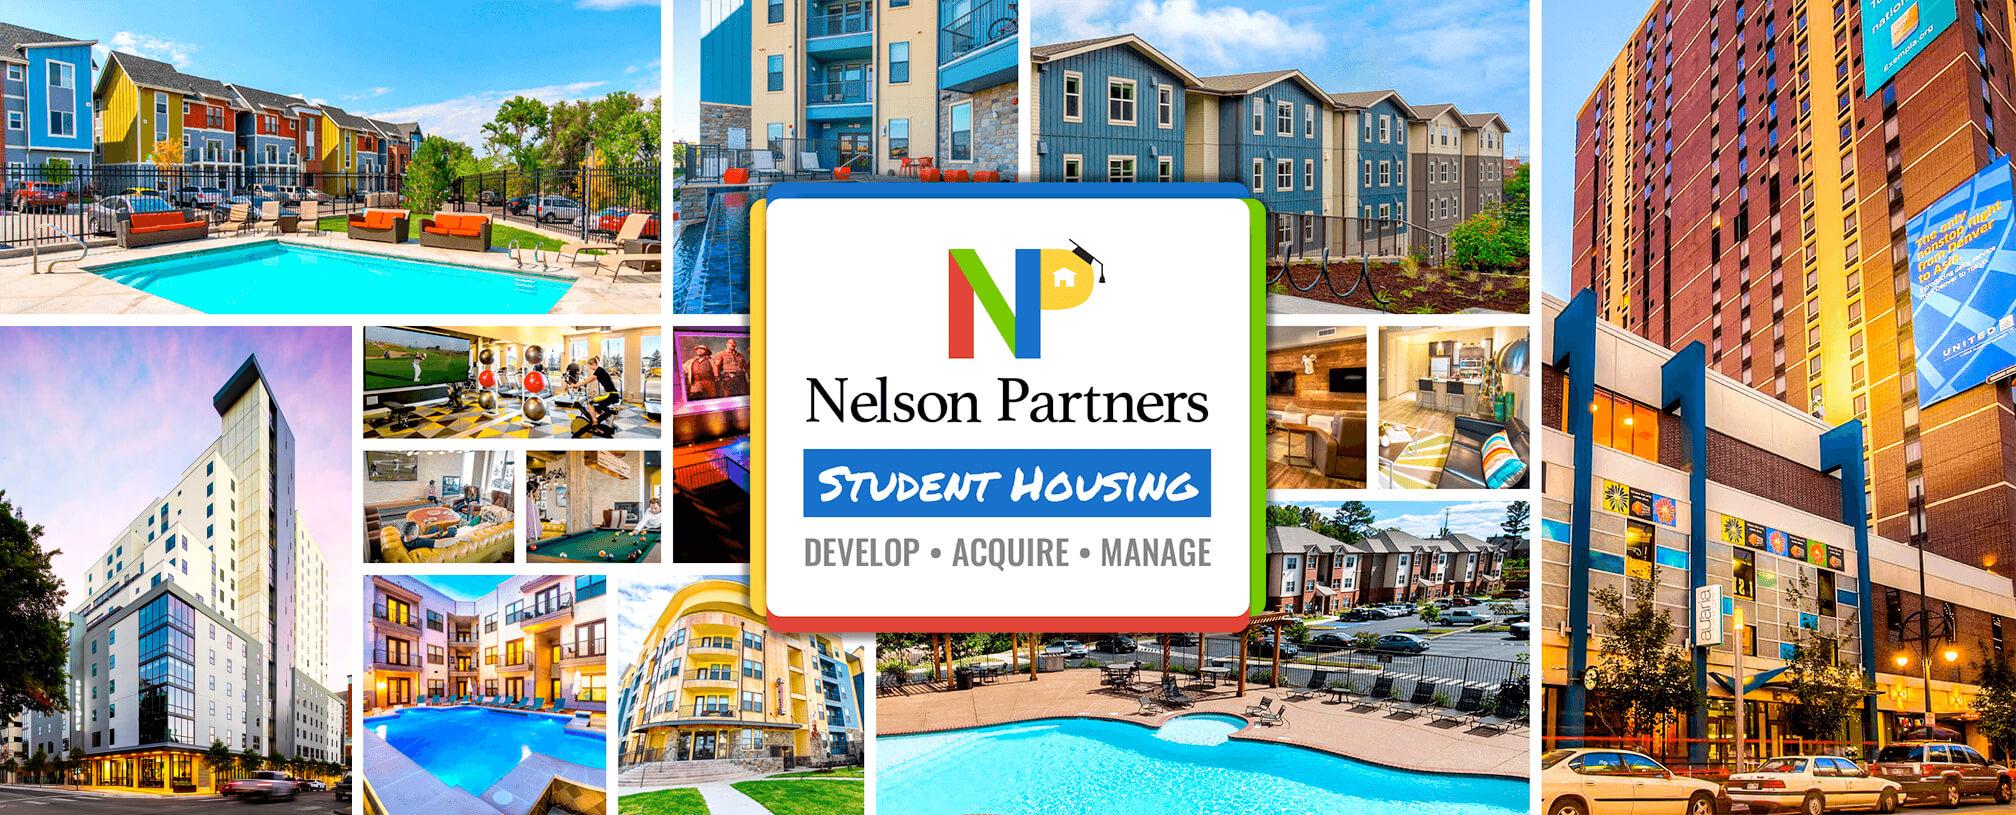 Nelson Partners LLC - Student Housing